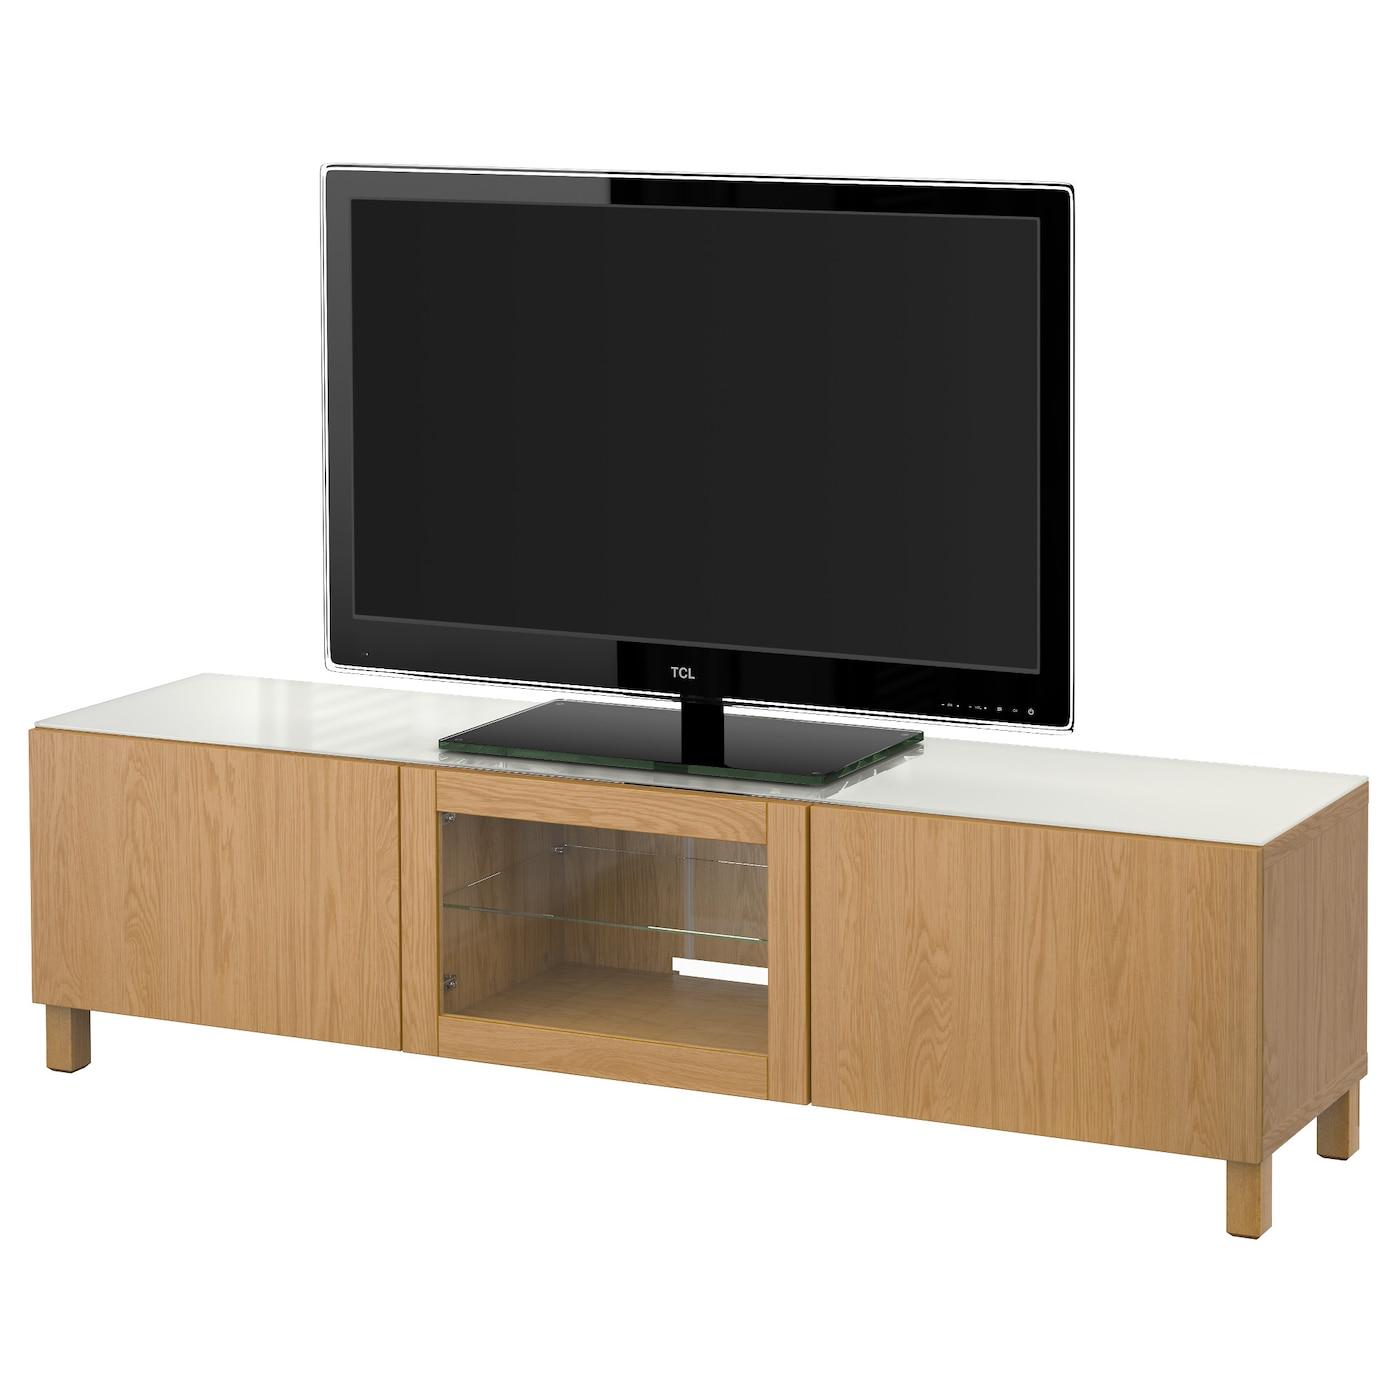 Best Tv Bench With Doors Lappviken Oak Effect 180x40x48 Cm Ikea